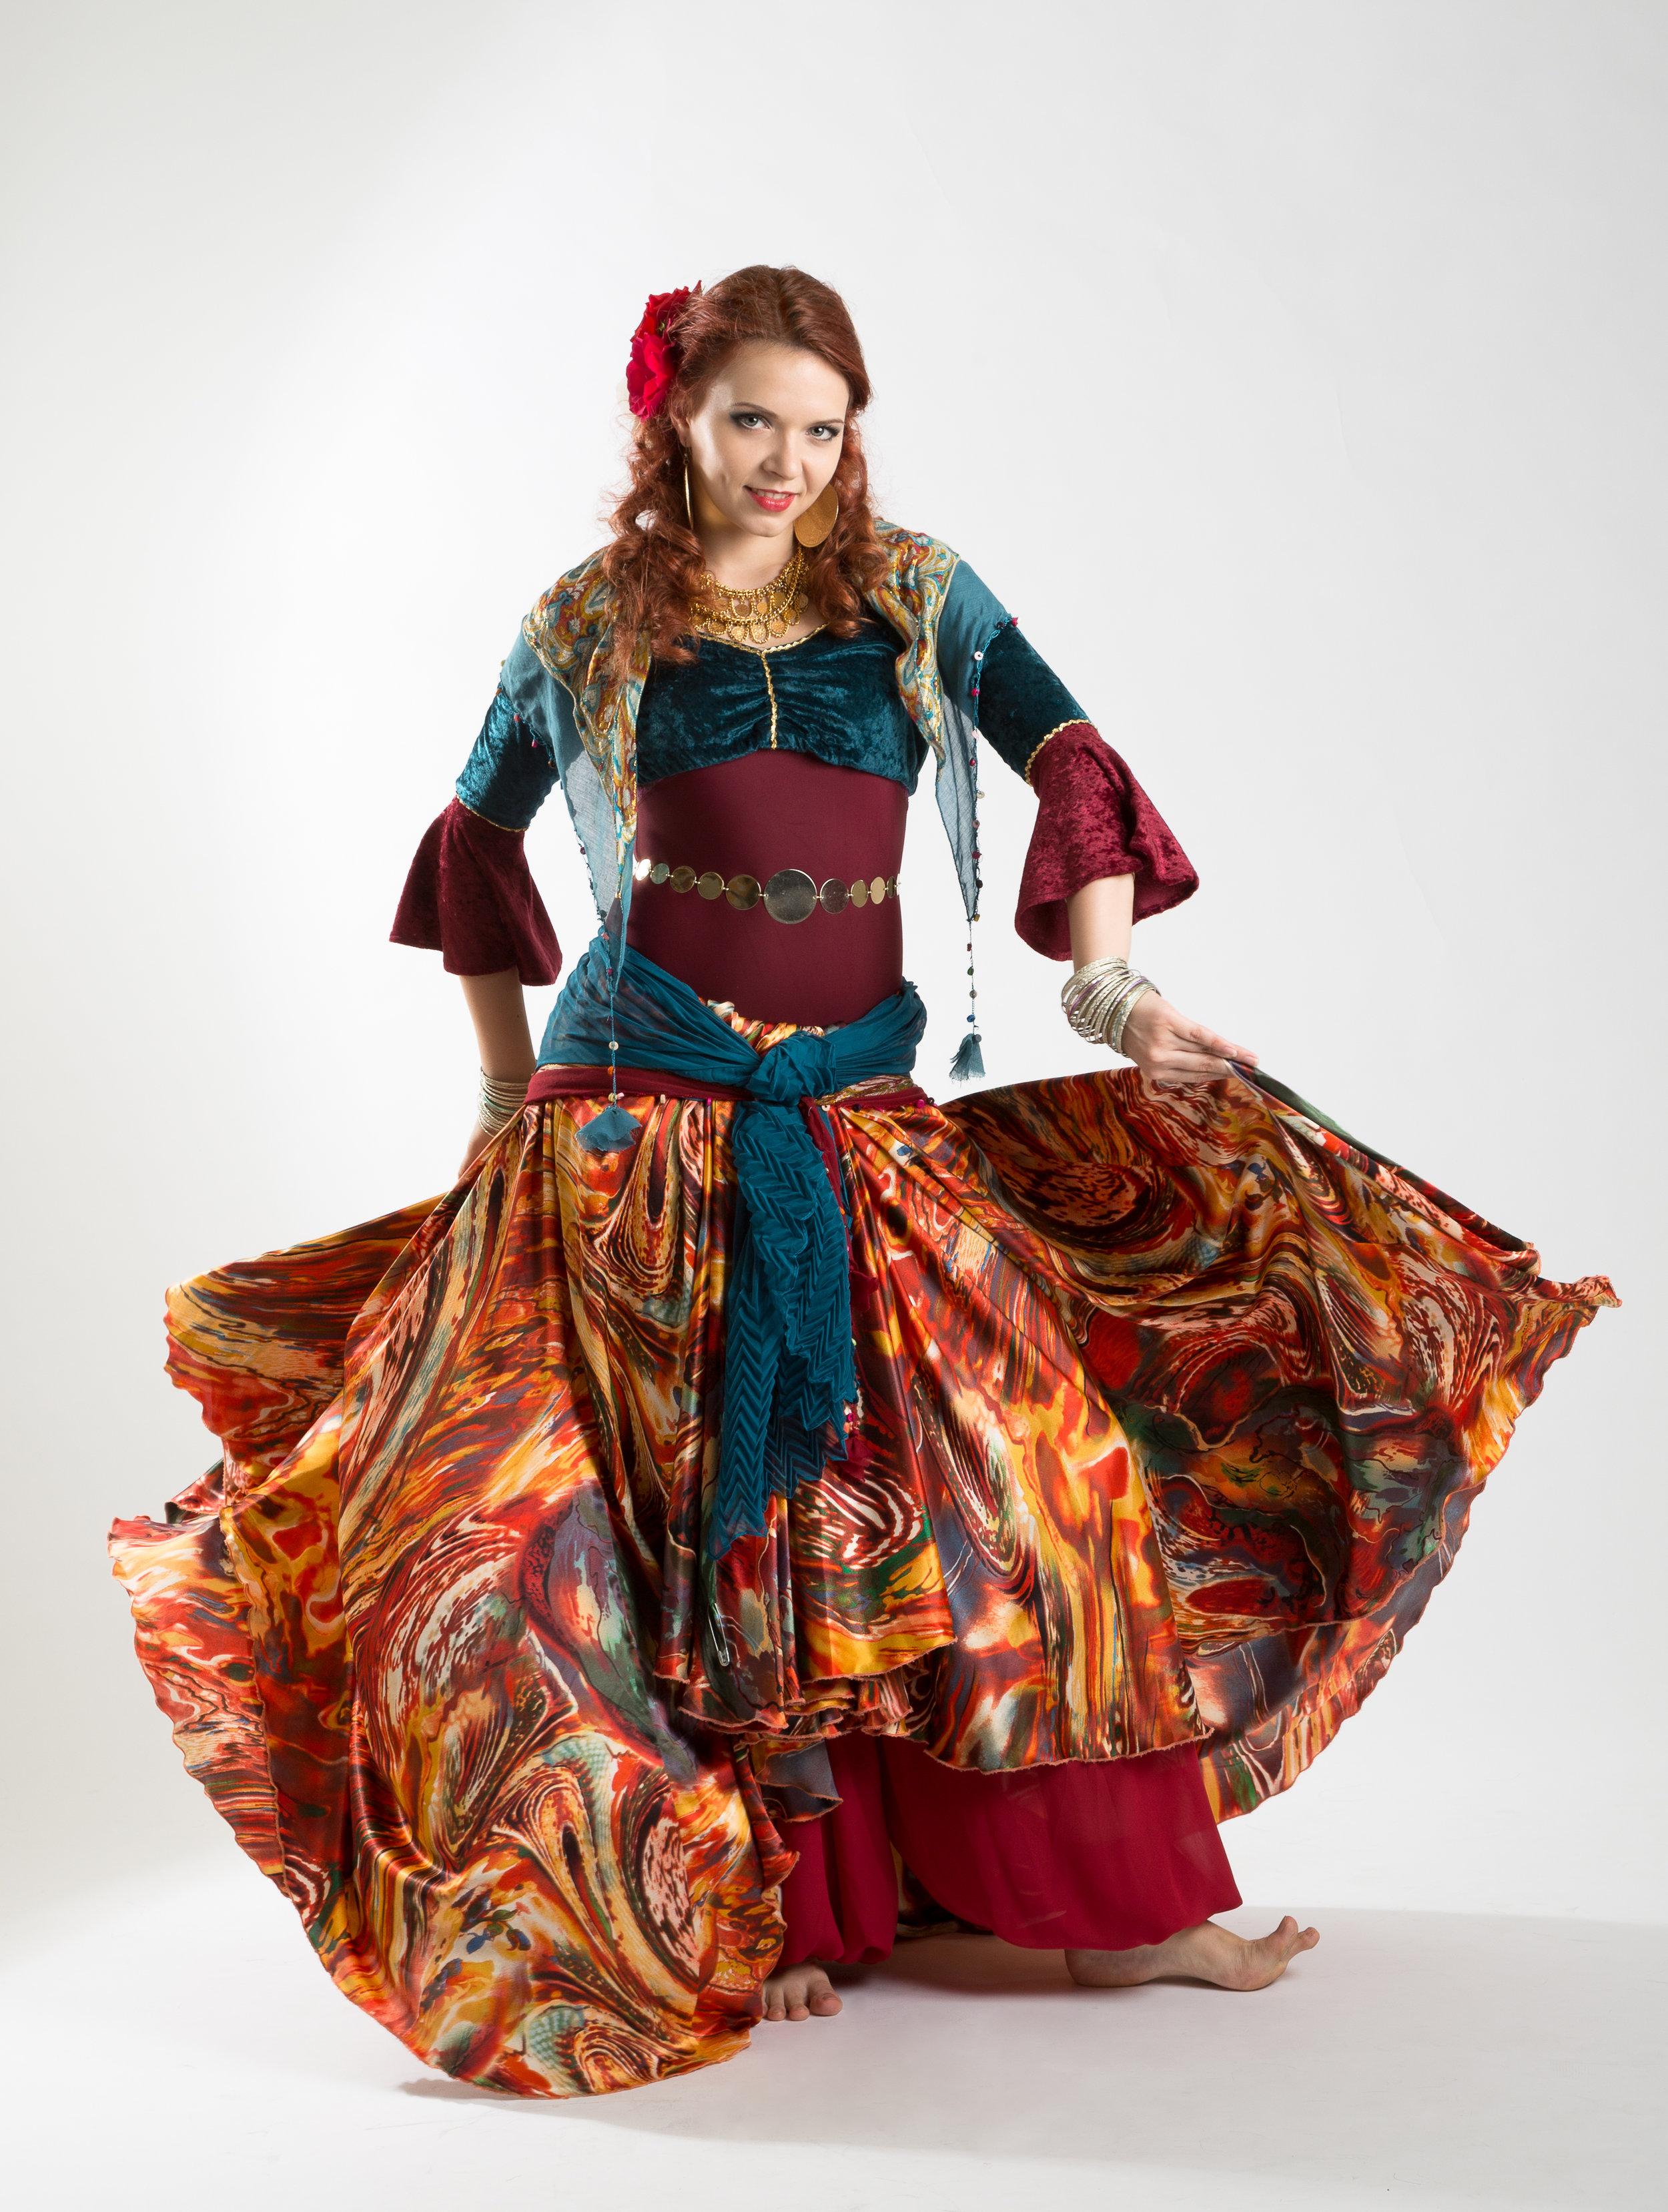 Turkish Dance in Toronto